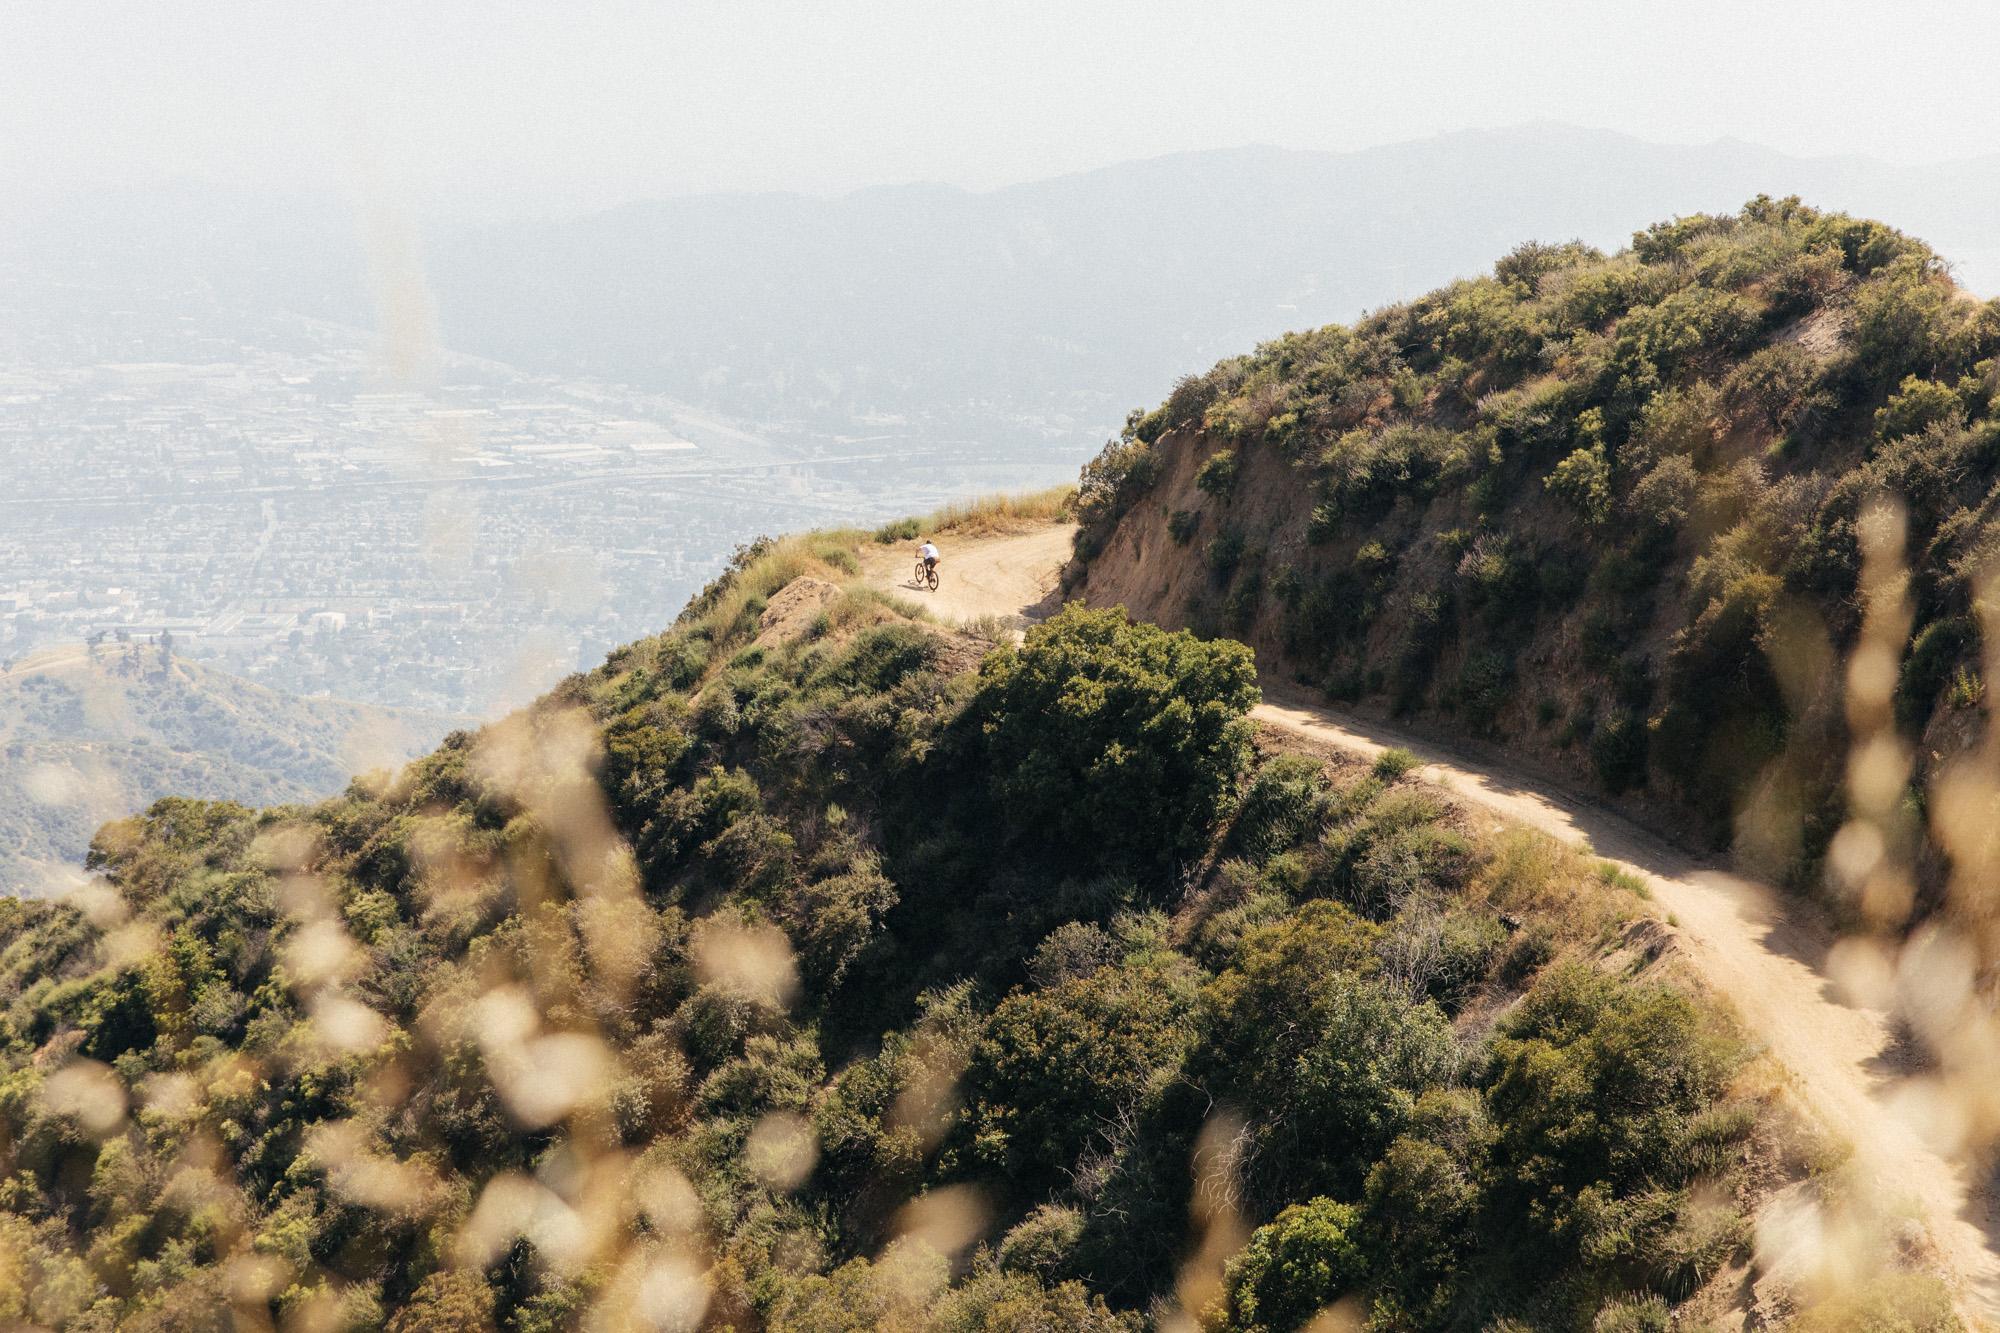 Climbing into the Verdugo Mountains in Glendale